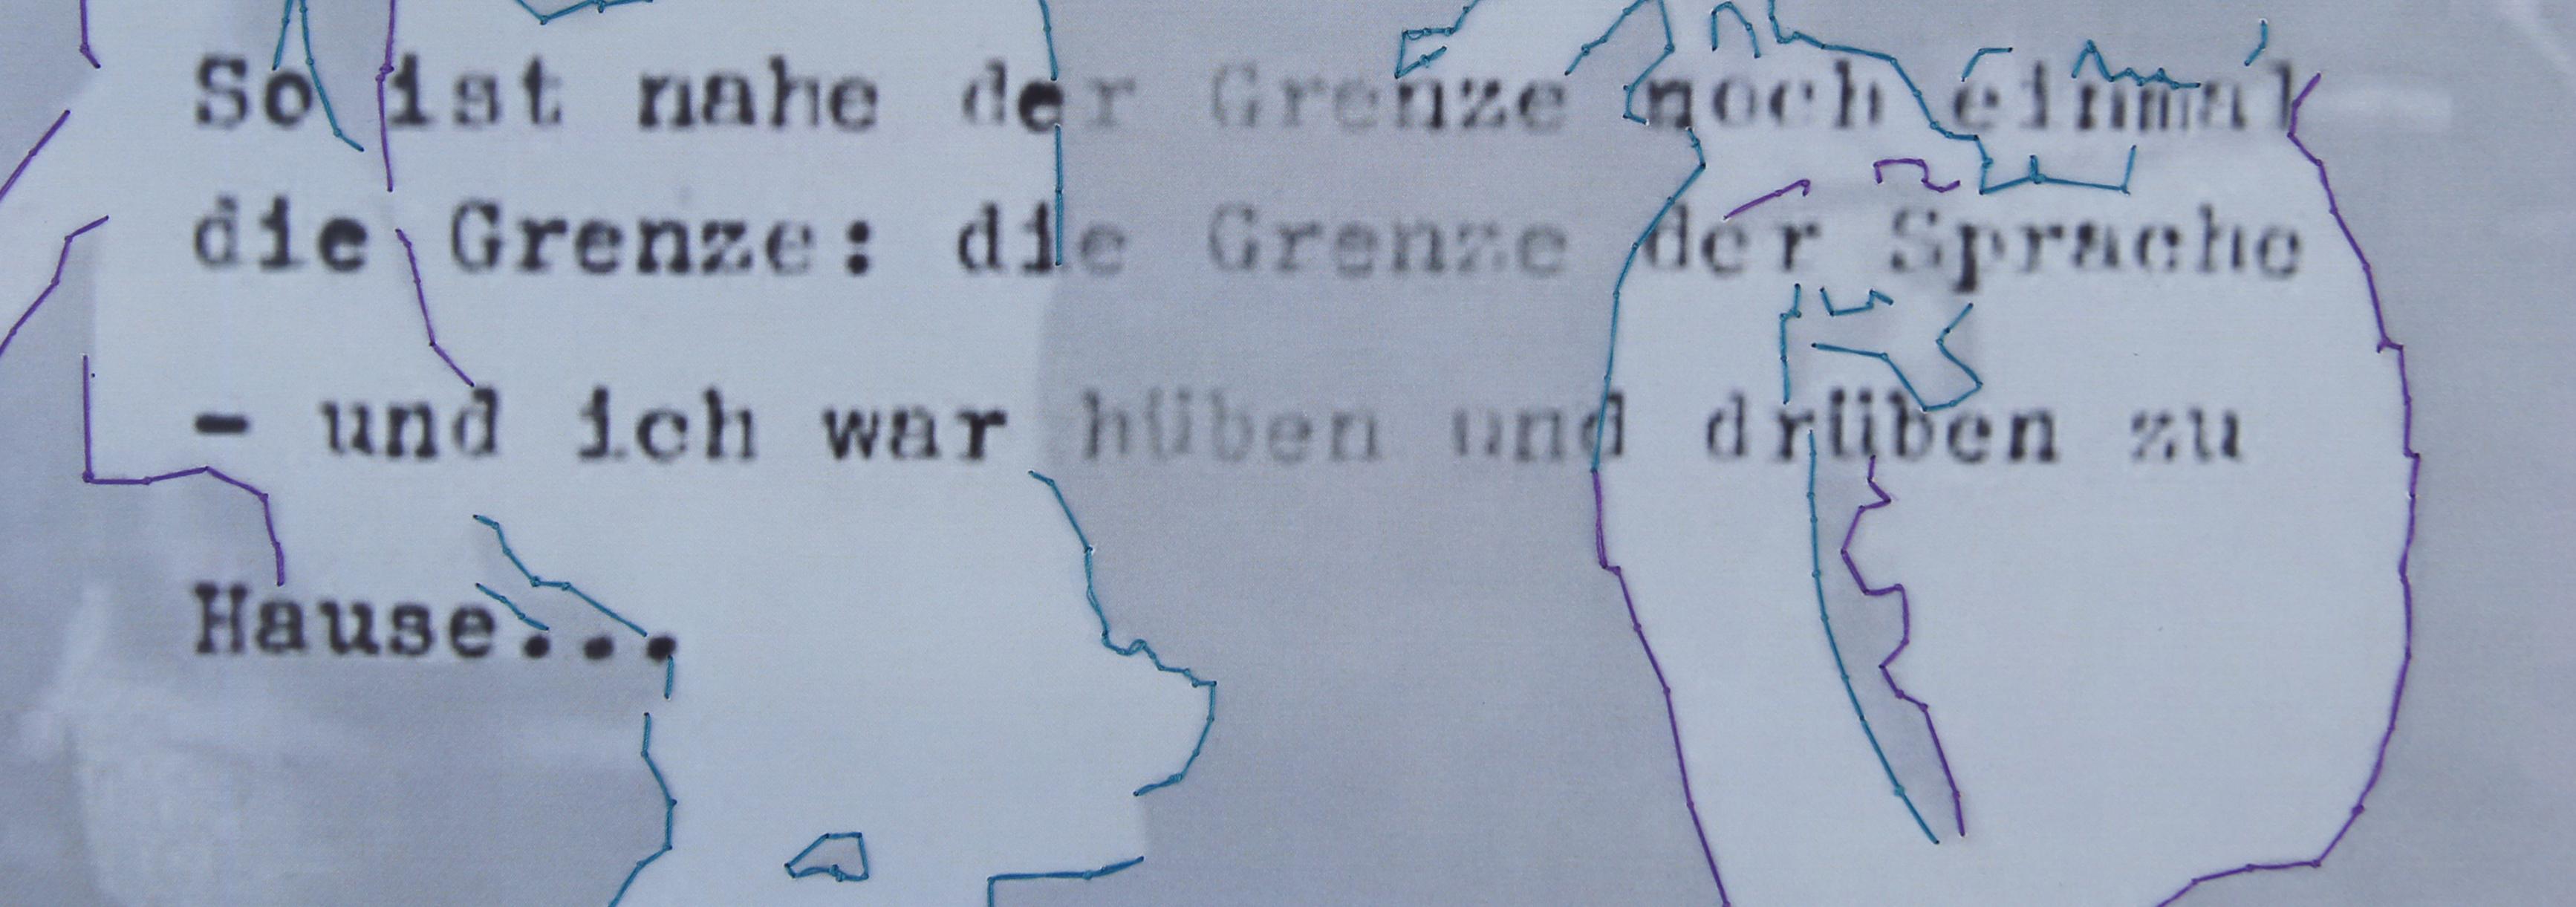 bachmann_ina_loitzl_grenze_hueben_drueben_8-e1436465615787